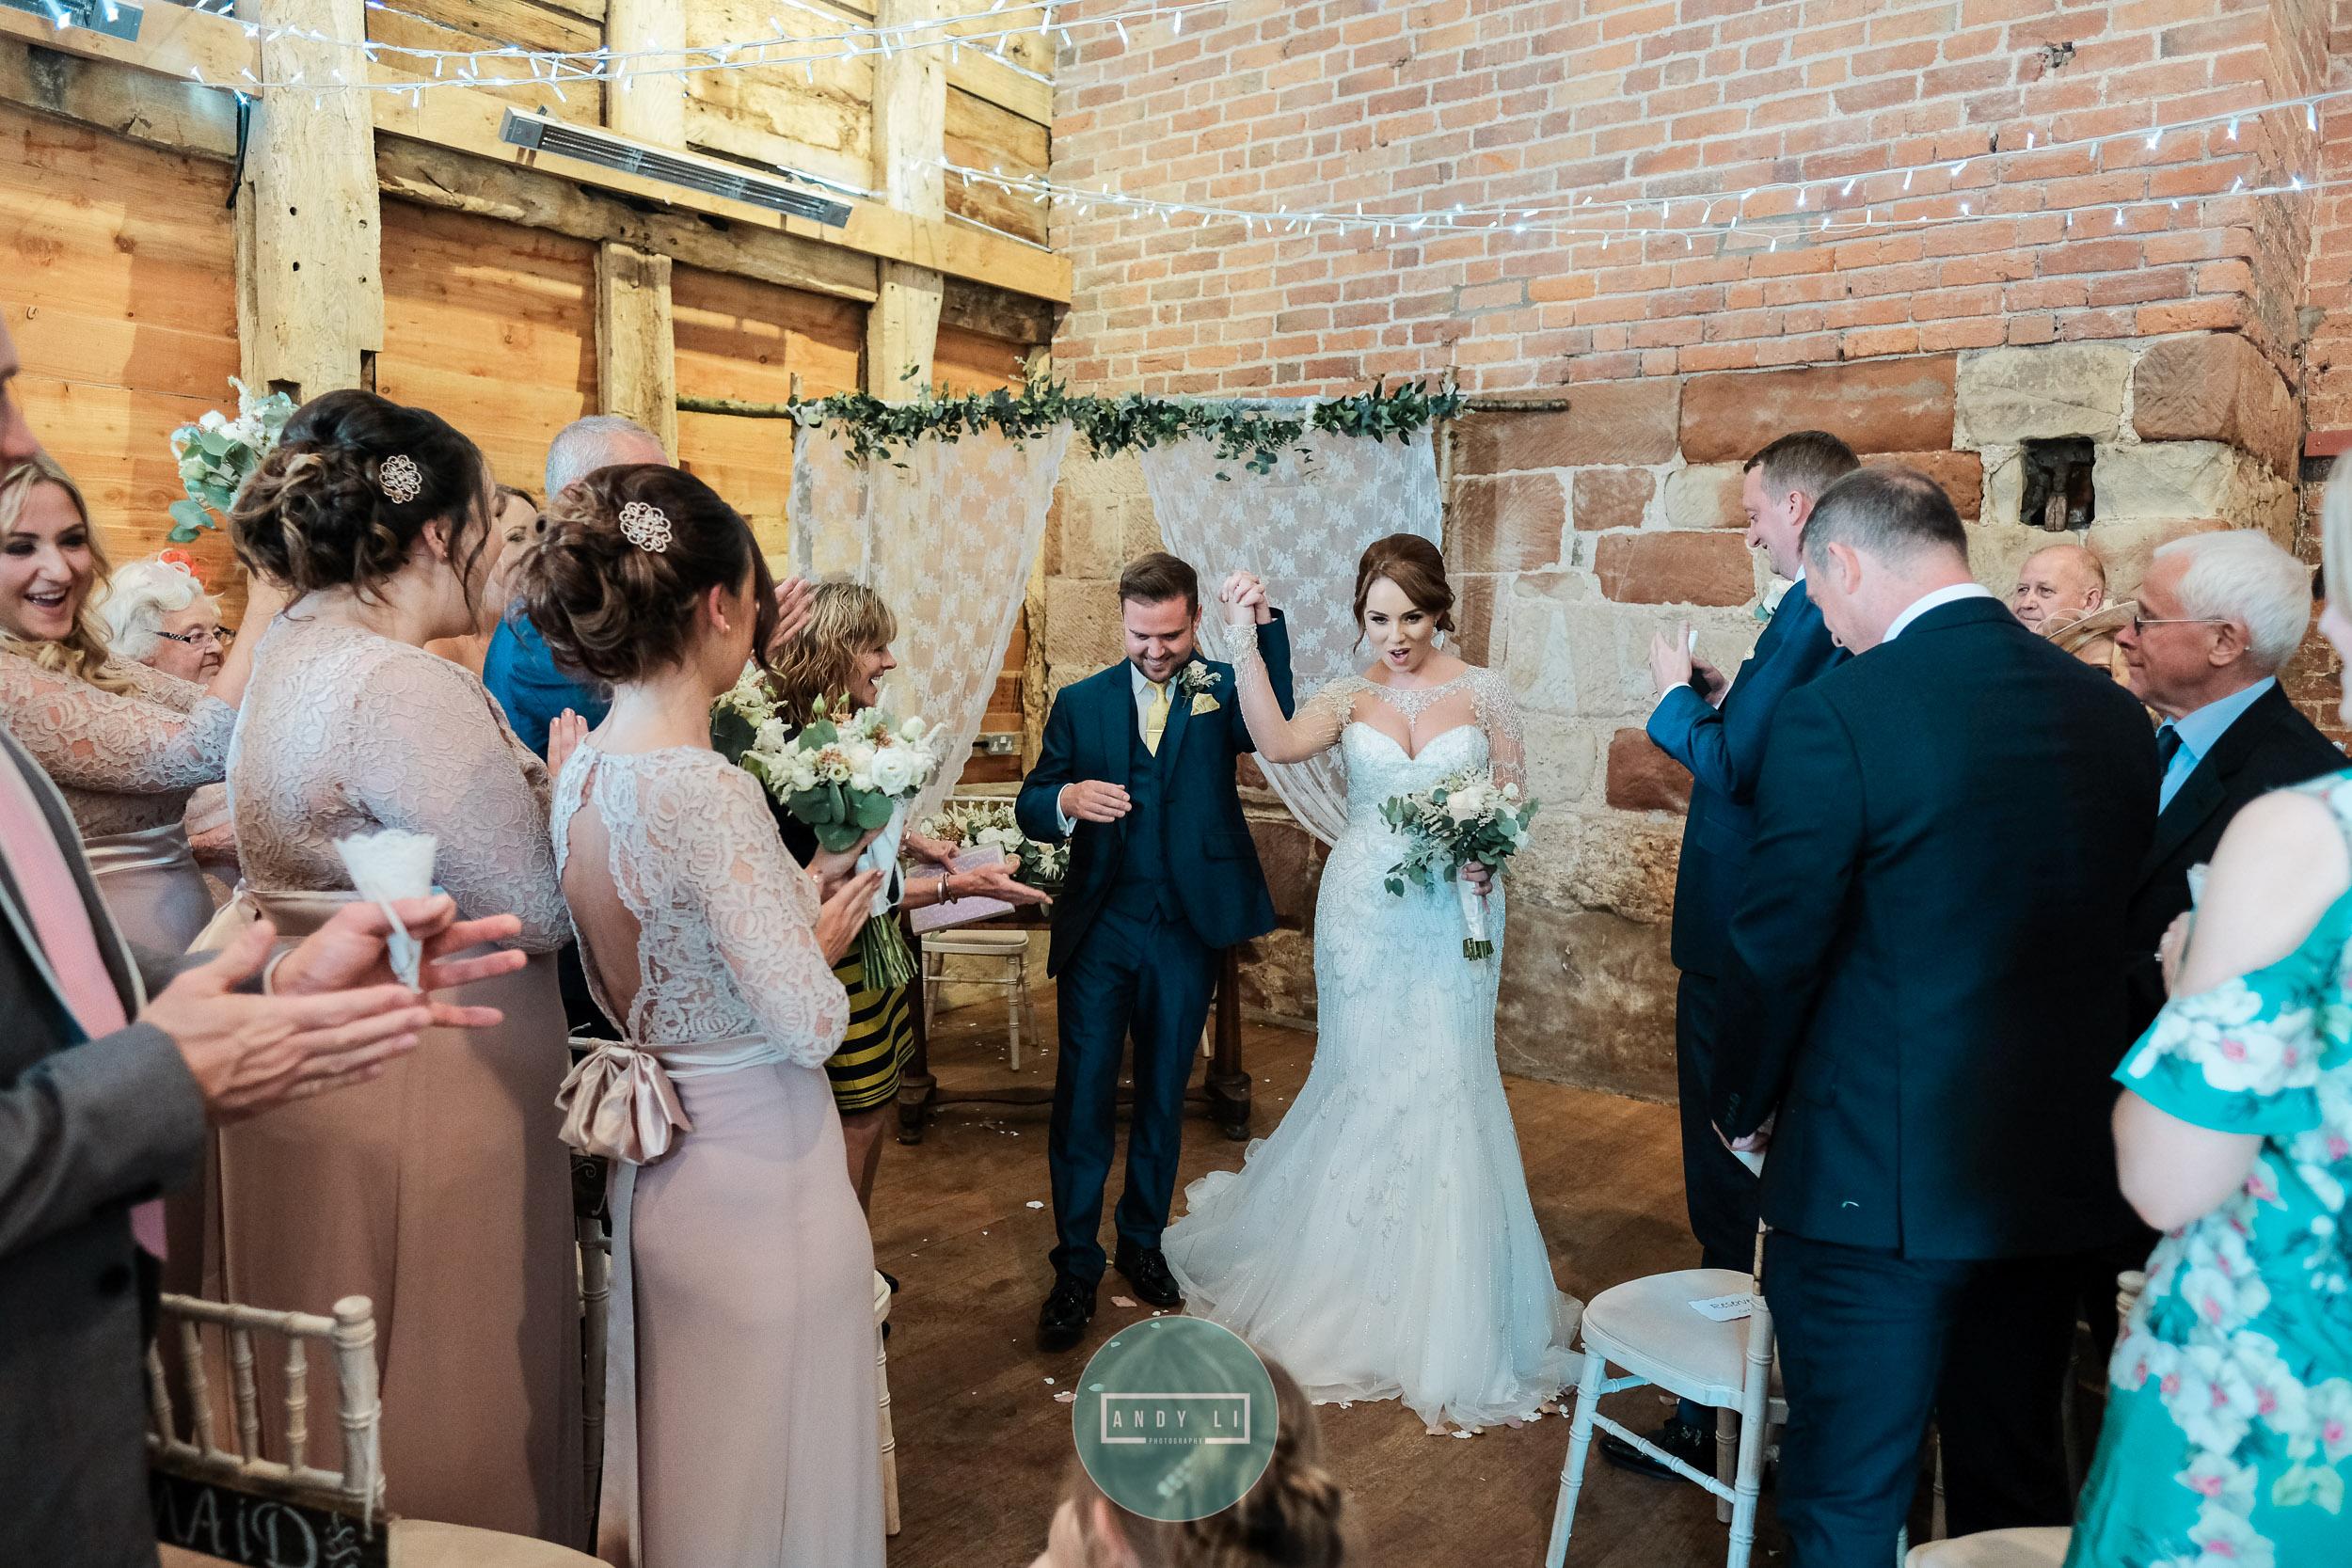 Pimhill Barn Wedding Photographer-067-XPRO6131.jpg